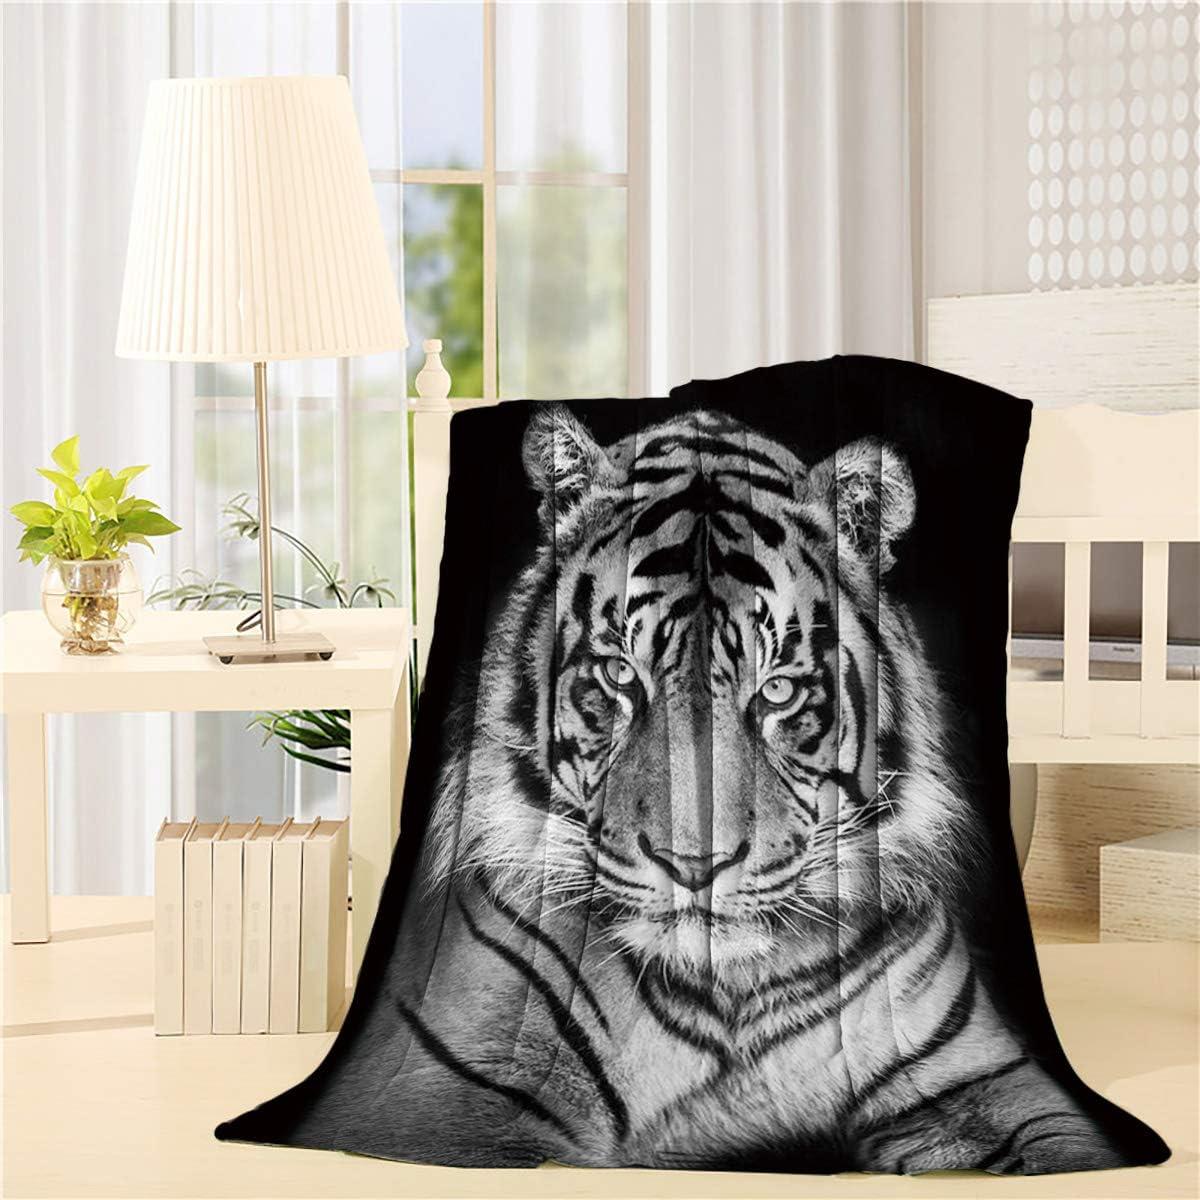 Savannan Flannel Fleece Blanket Tiger Wild Wh Black Life Max 69% OFF Animal Washington Mall